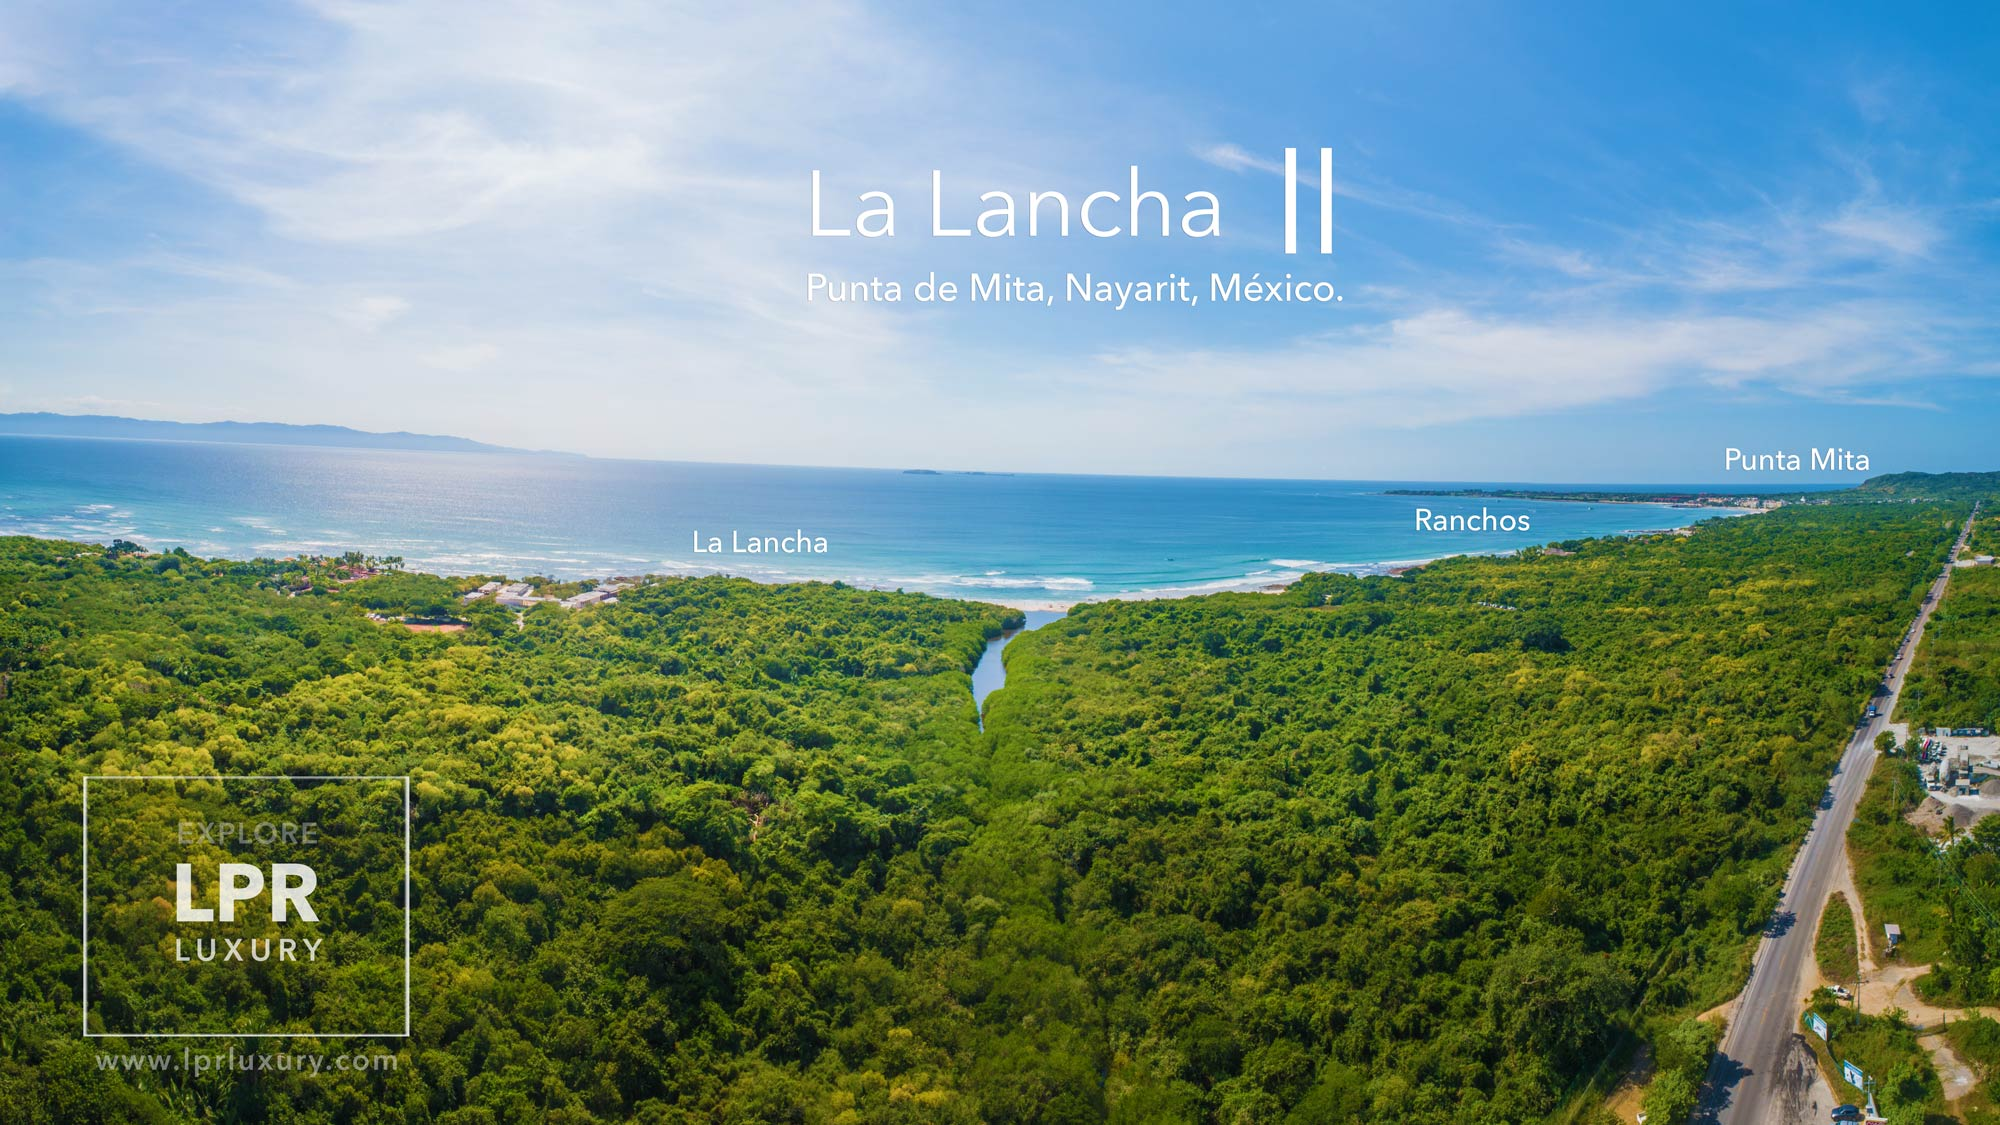 La Lancha - Punta Mita resort beachfront luxury estate villas and condos. Luxury real estate for sale at the Punta Mita Resort, Riviera Nayarit, Mexico